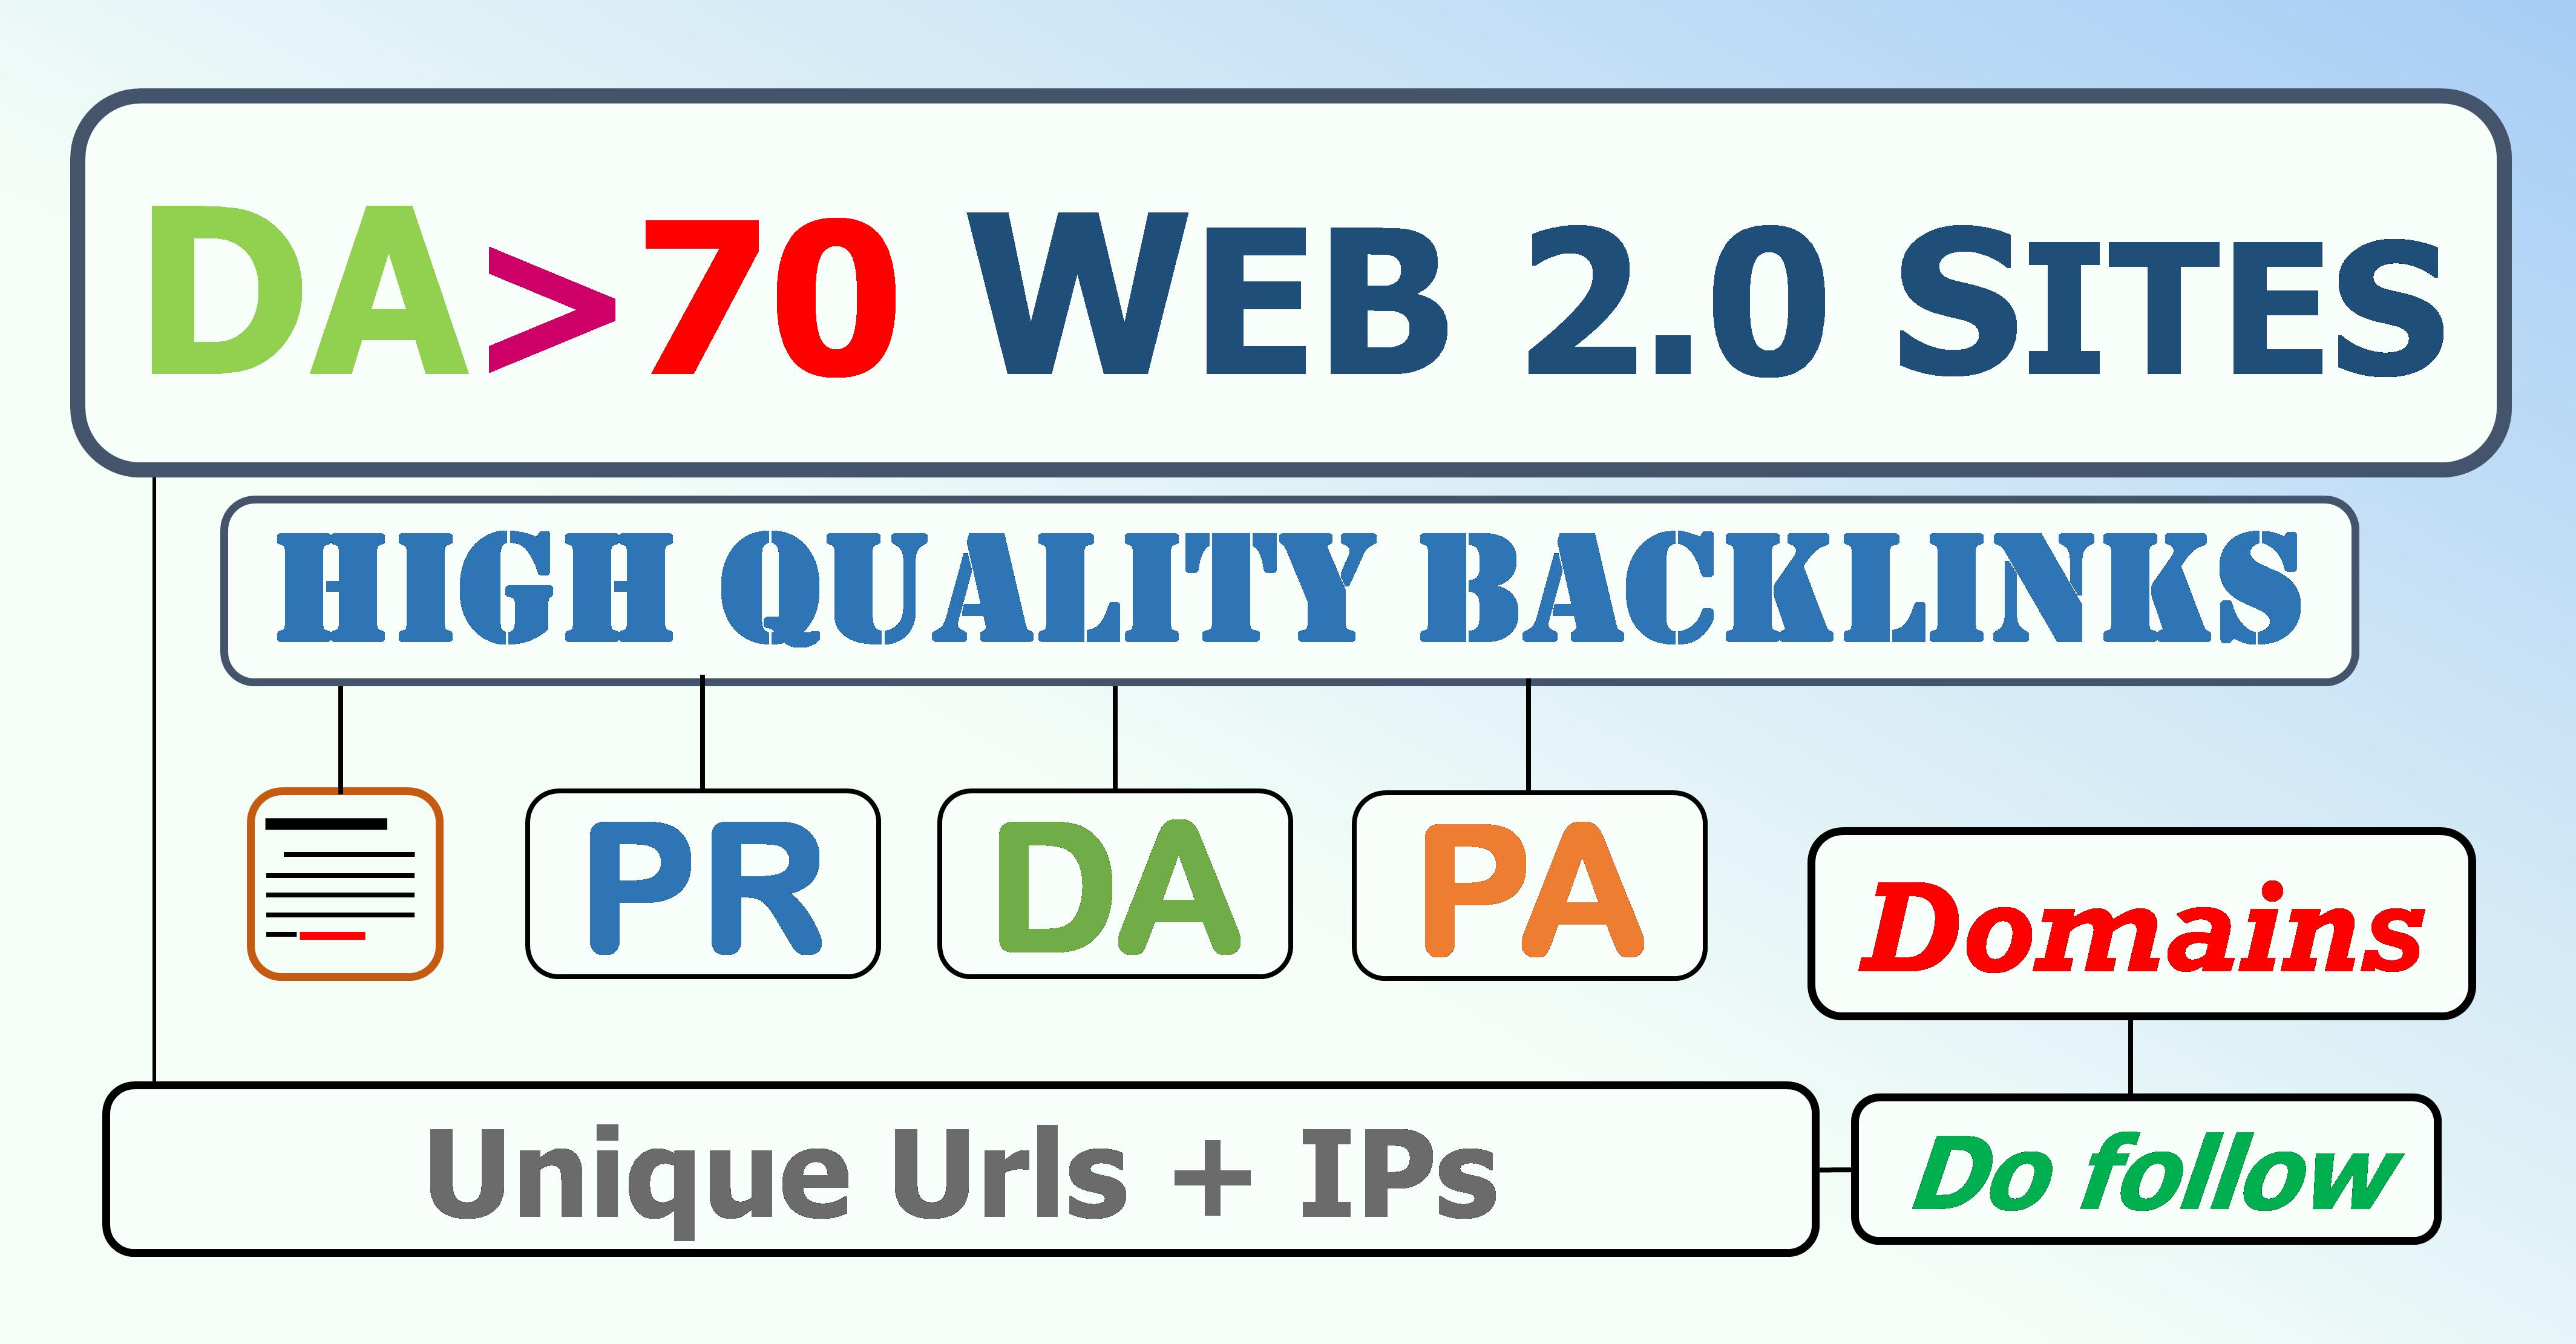 Unique DA 70-77 Social Web backlinks according to your keywords